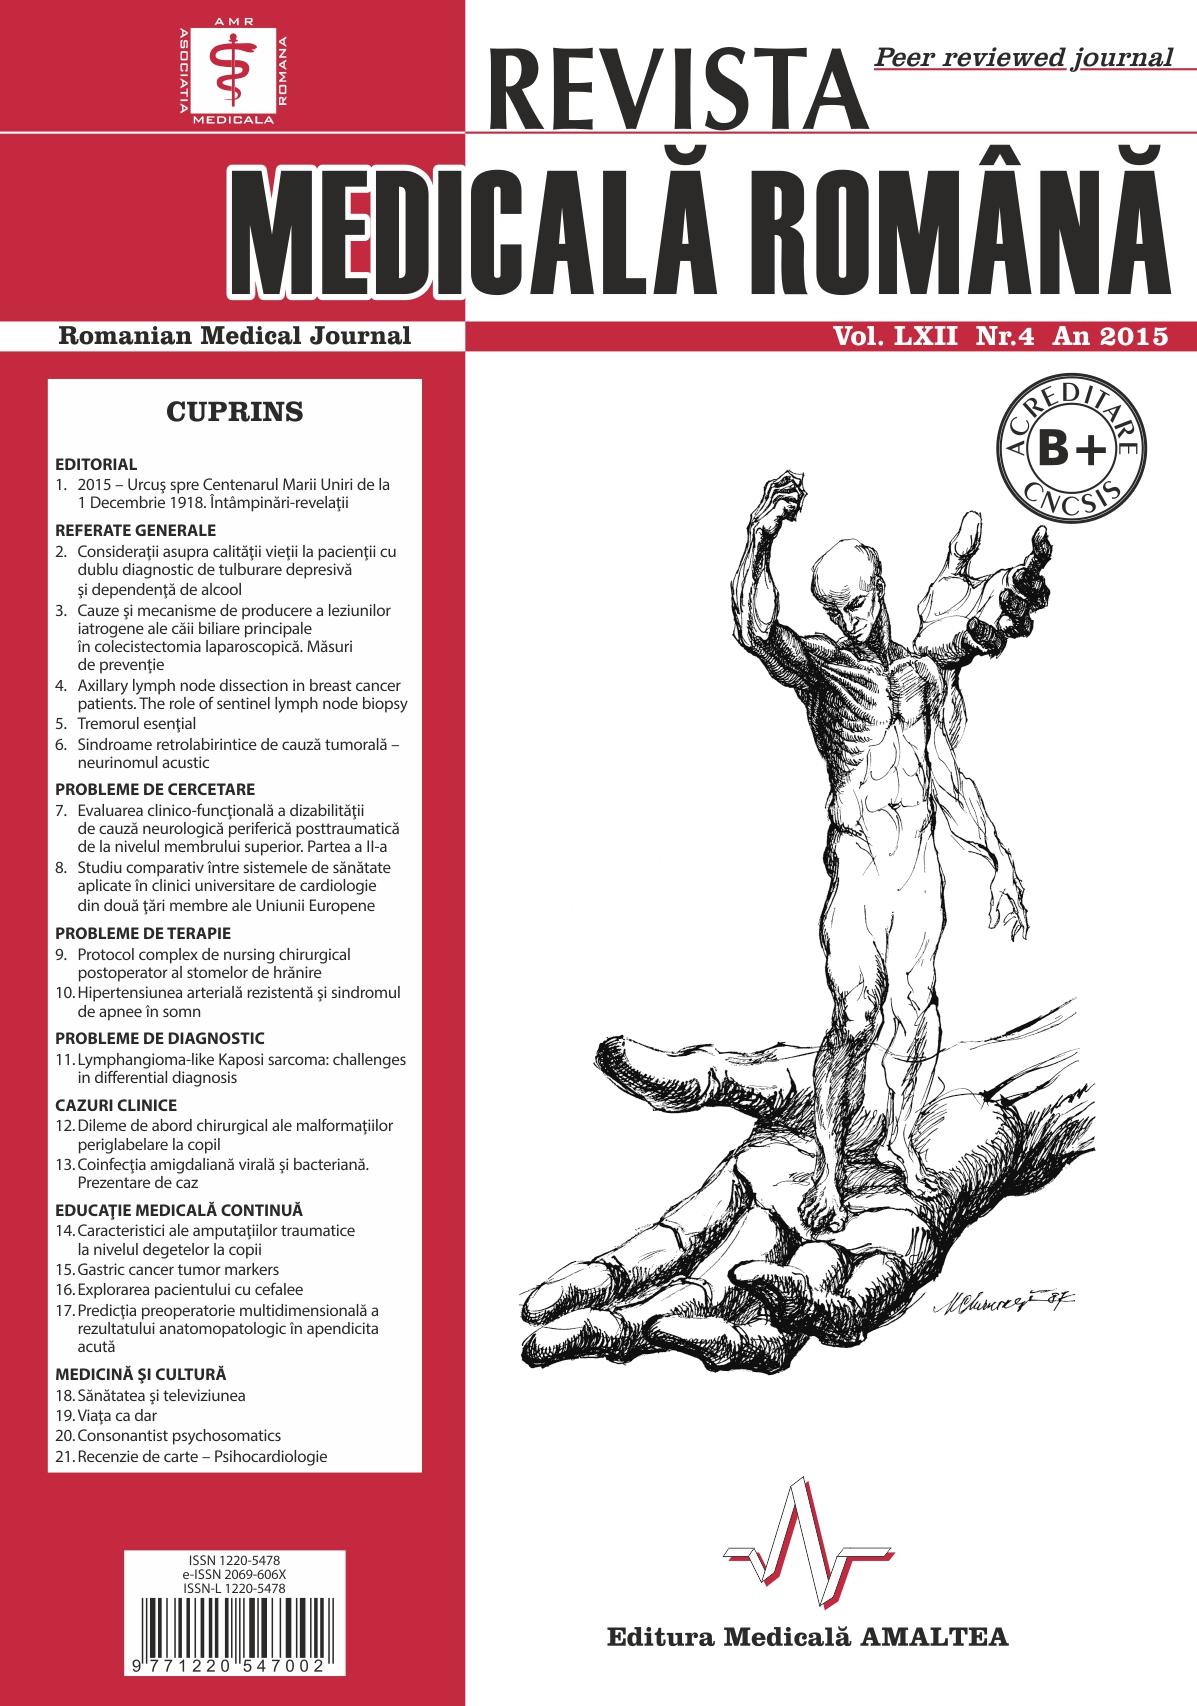 REVISTA MEDICALA ROMANA - Romanian Medical Journal, Vol. LXII, Nr. 4, An 2015